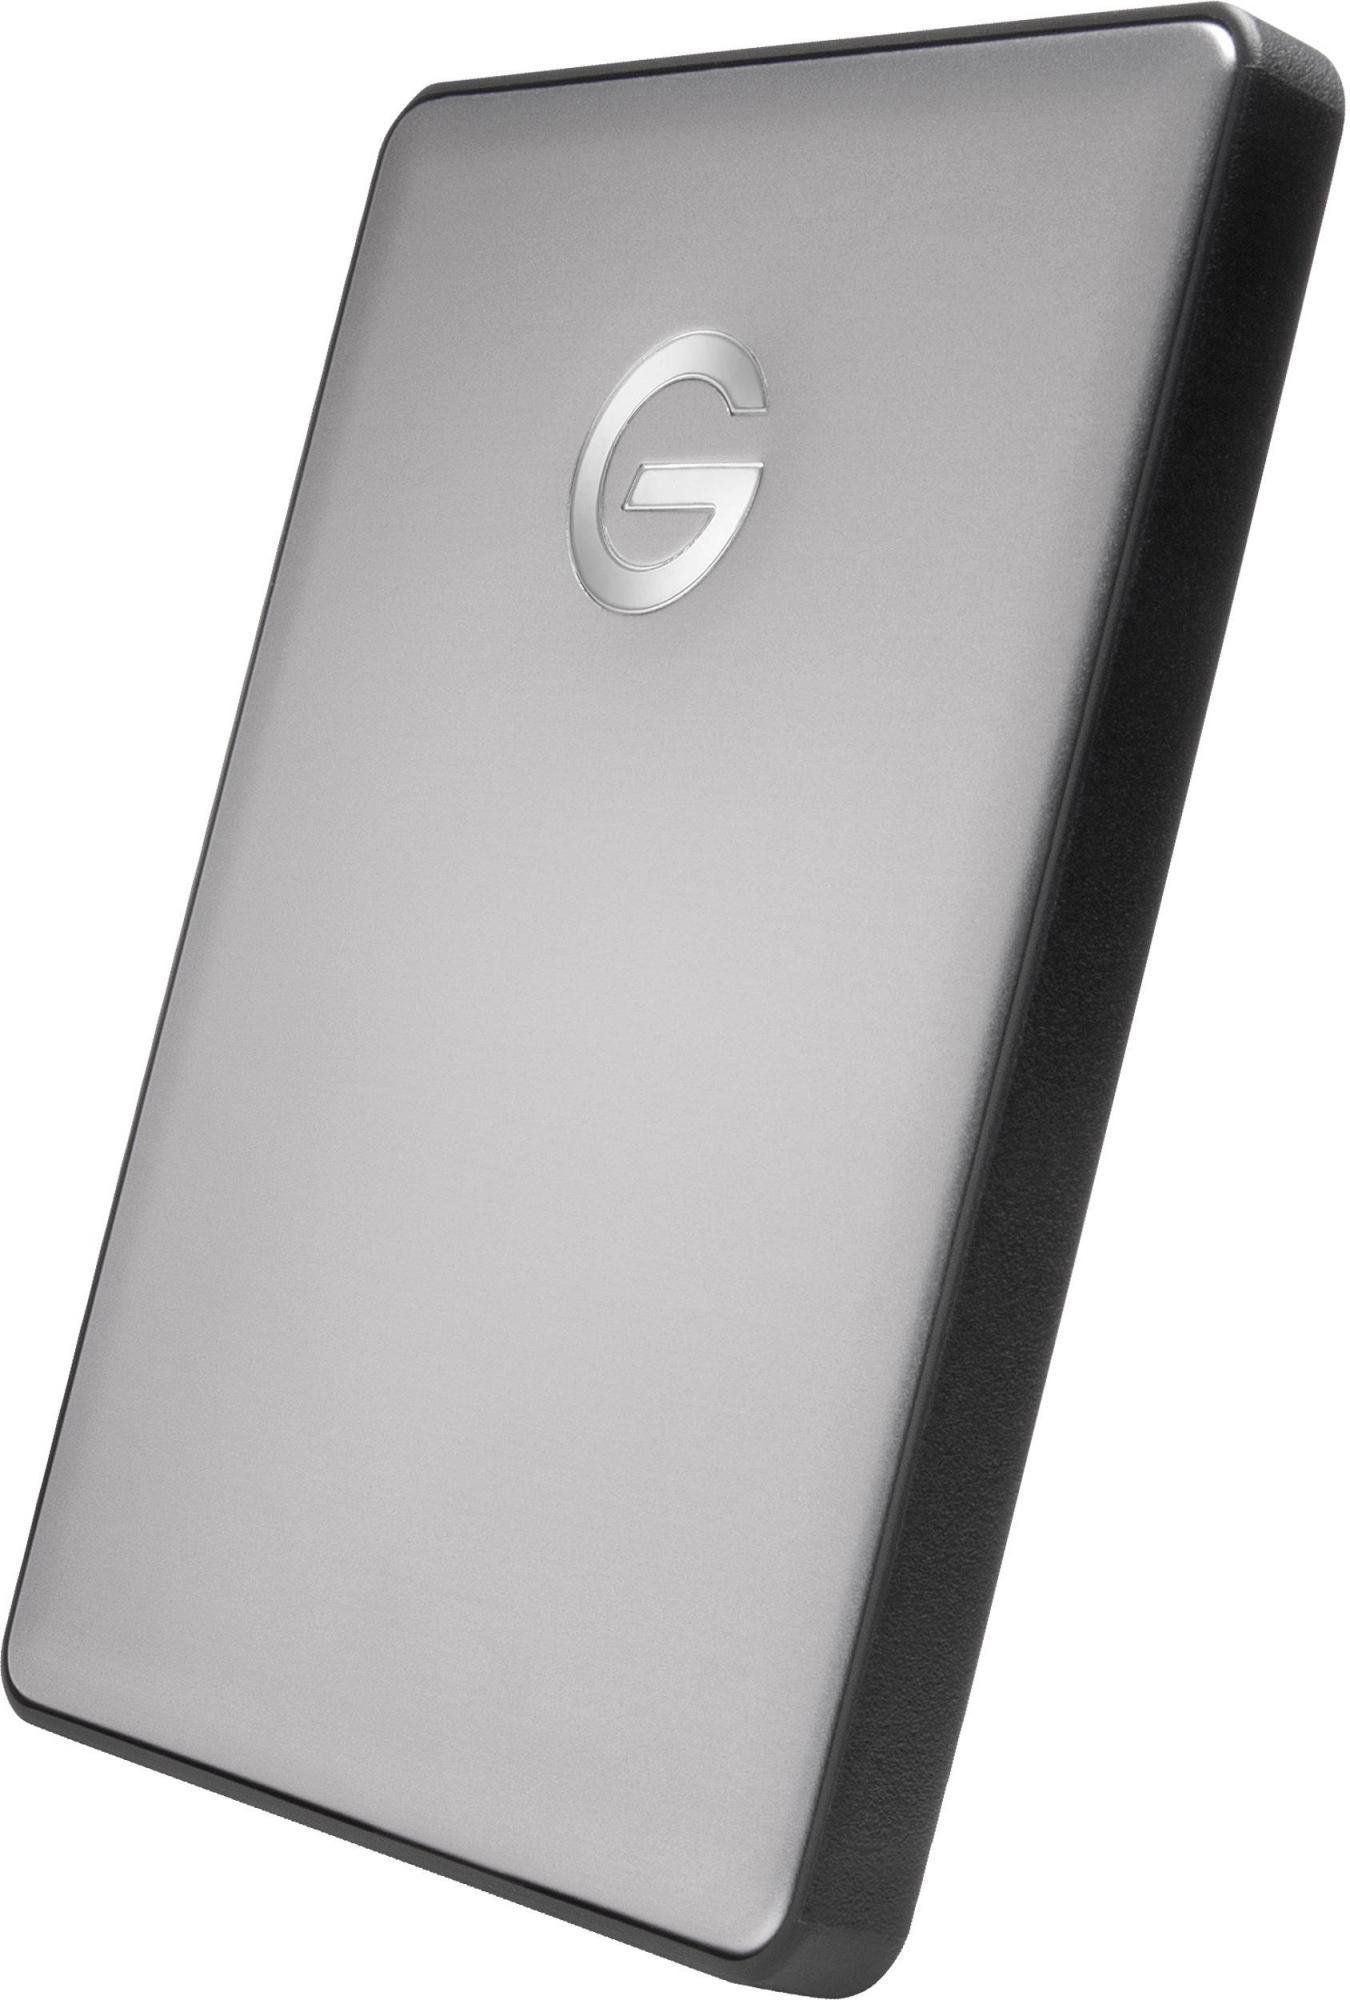 "Внешний жесткий диск G-Tech G-Drive Mobile (0G10317-1) 2TB 2.5"" USB-C (Space Gray) фото"